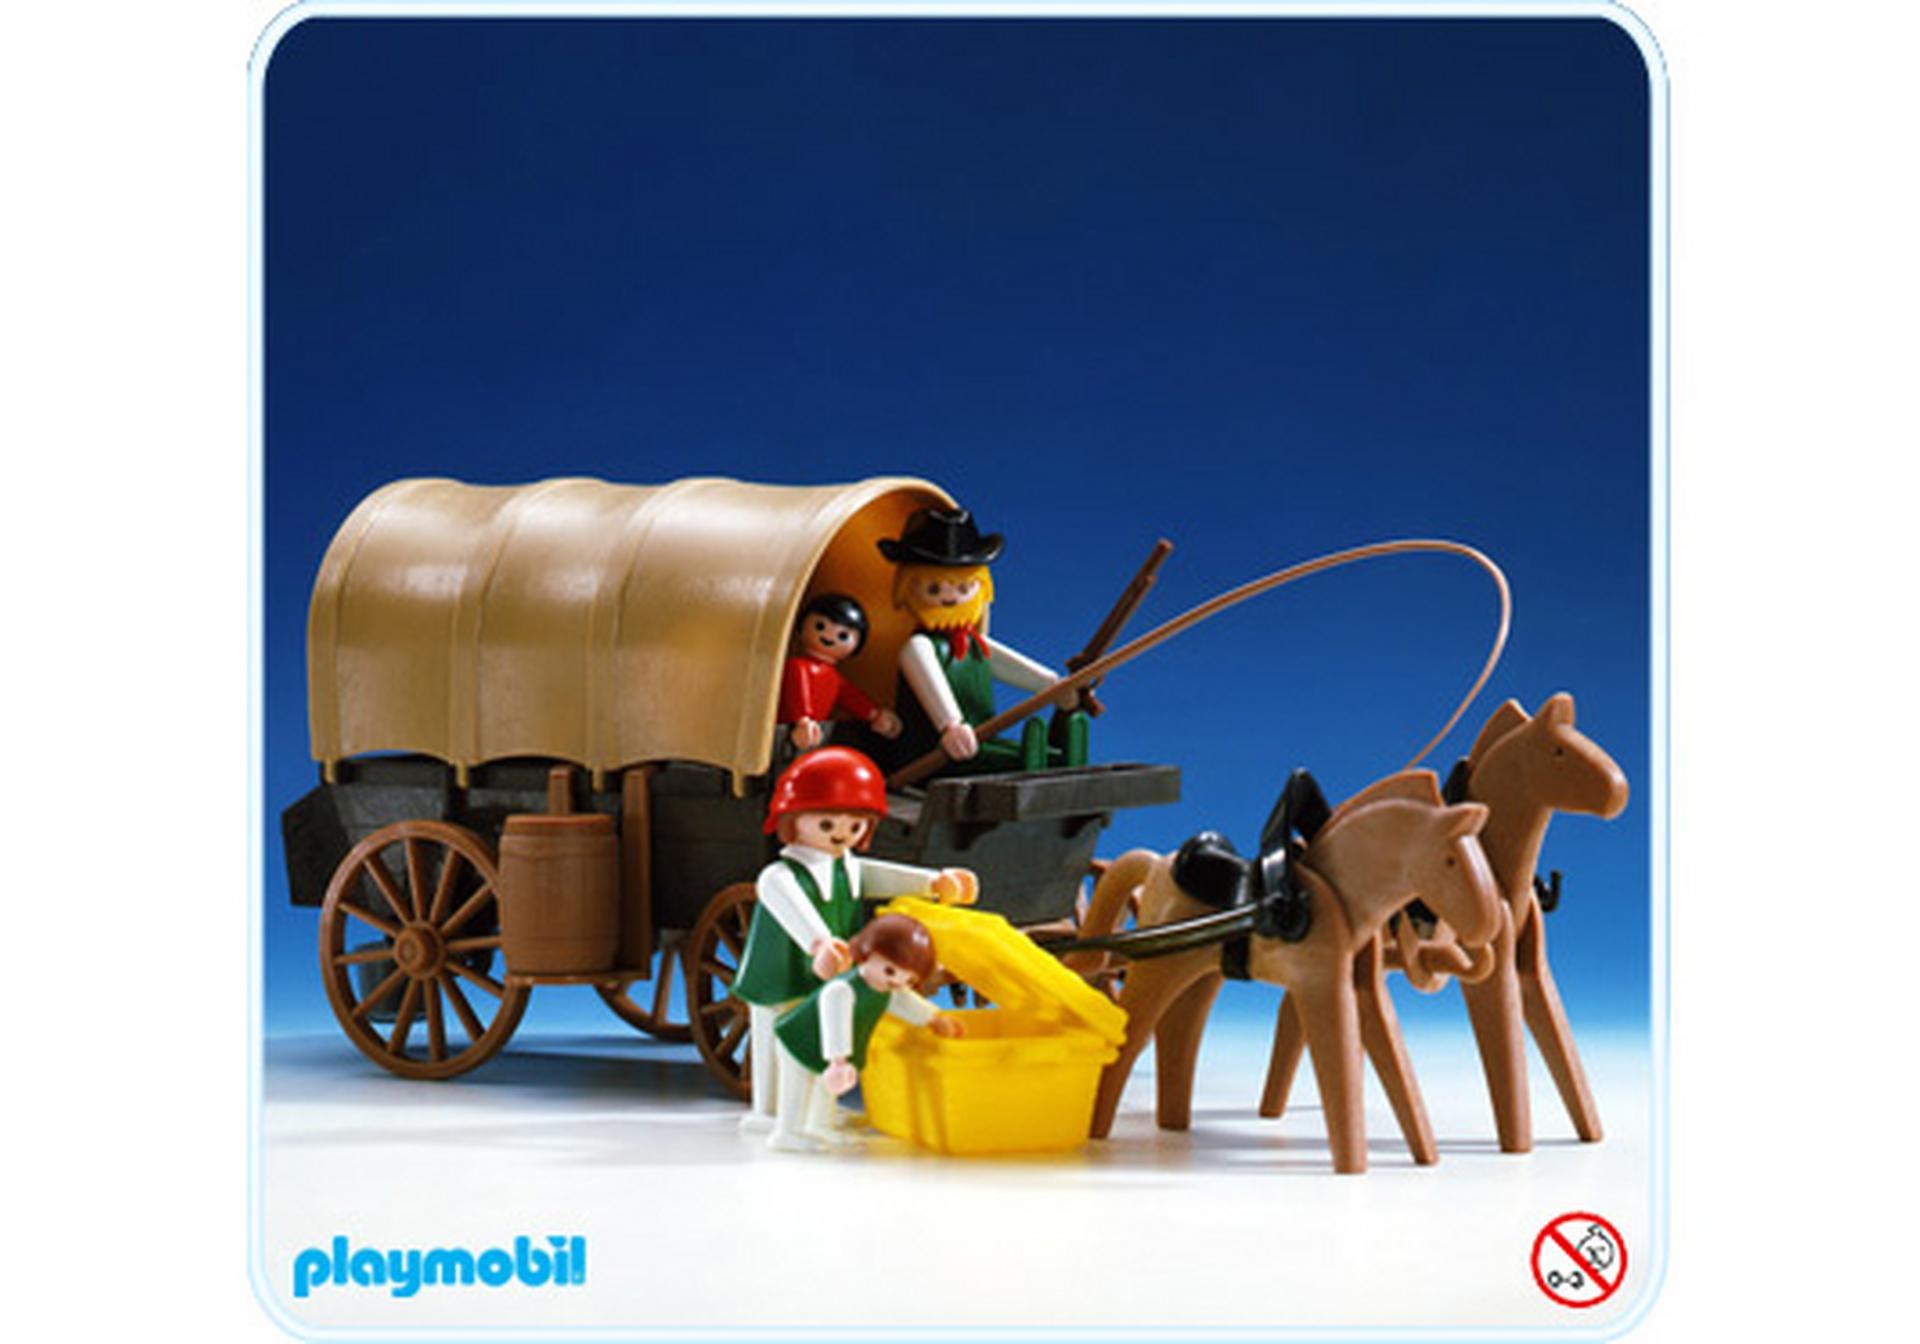 Planwagen 3278 a playmobil deutschland for Jugendzimmer playmobil